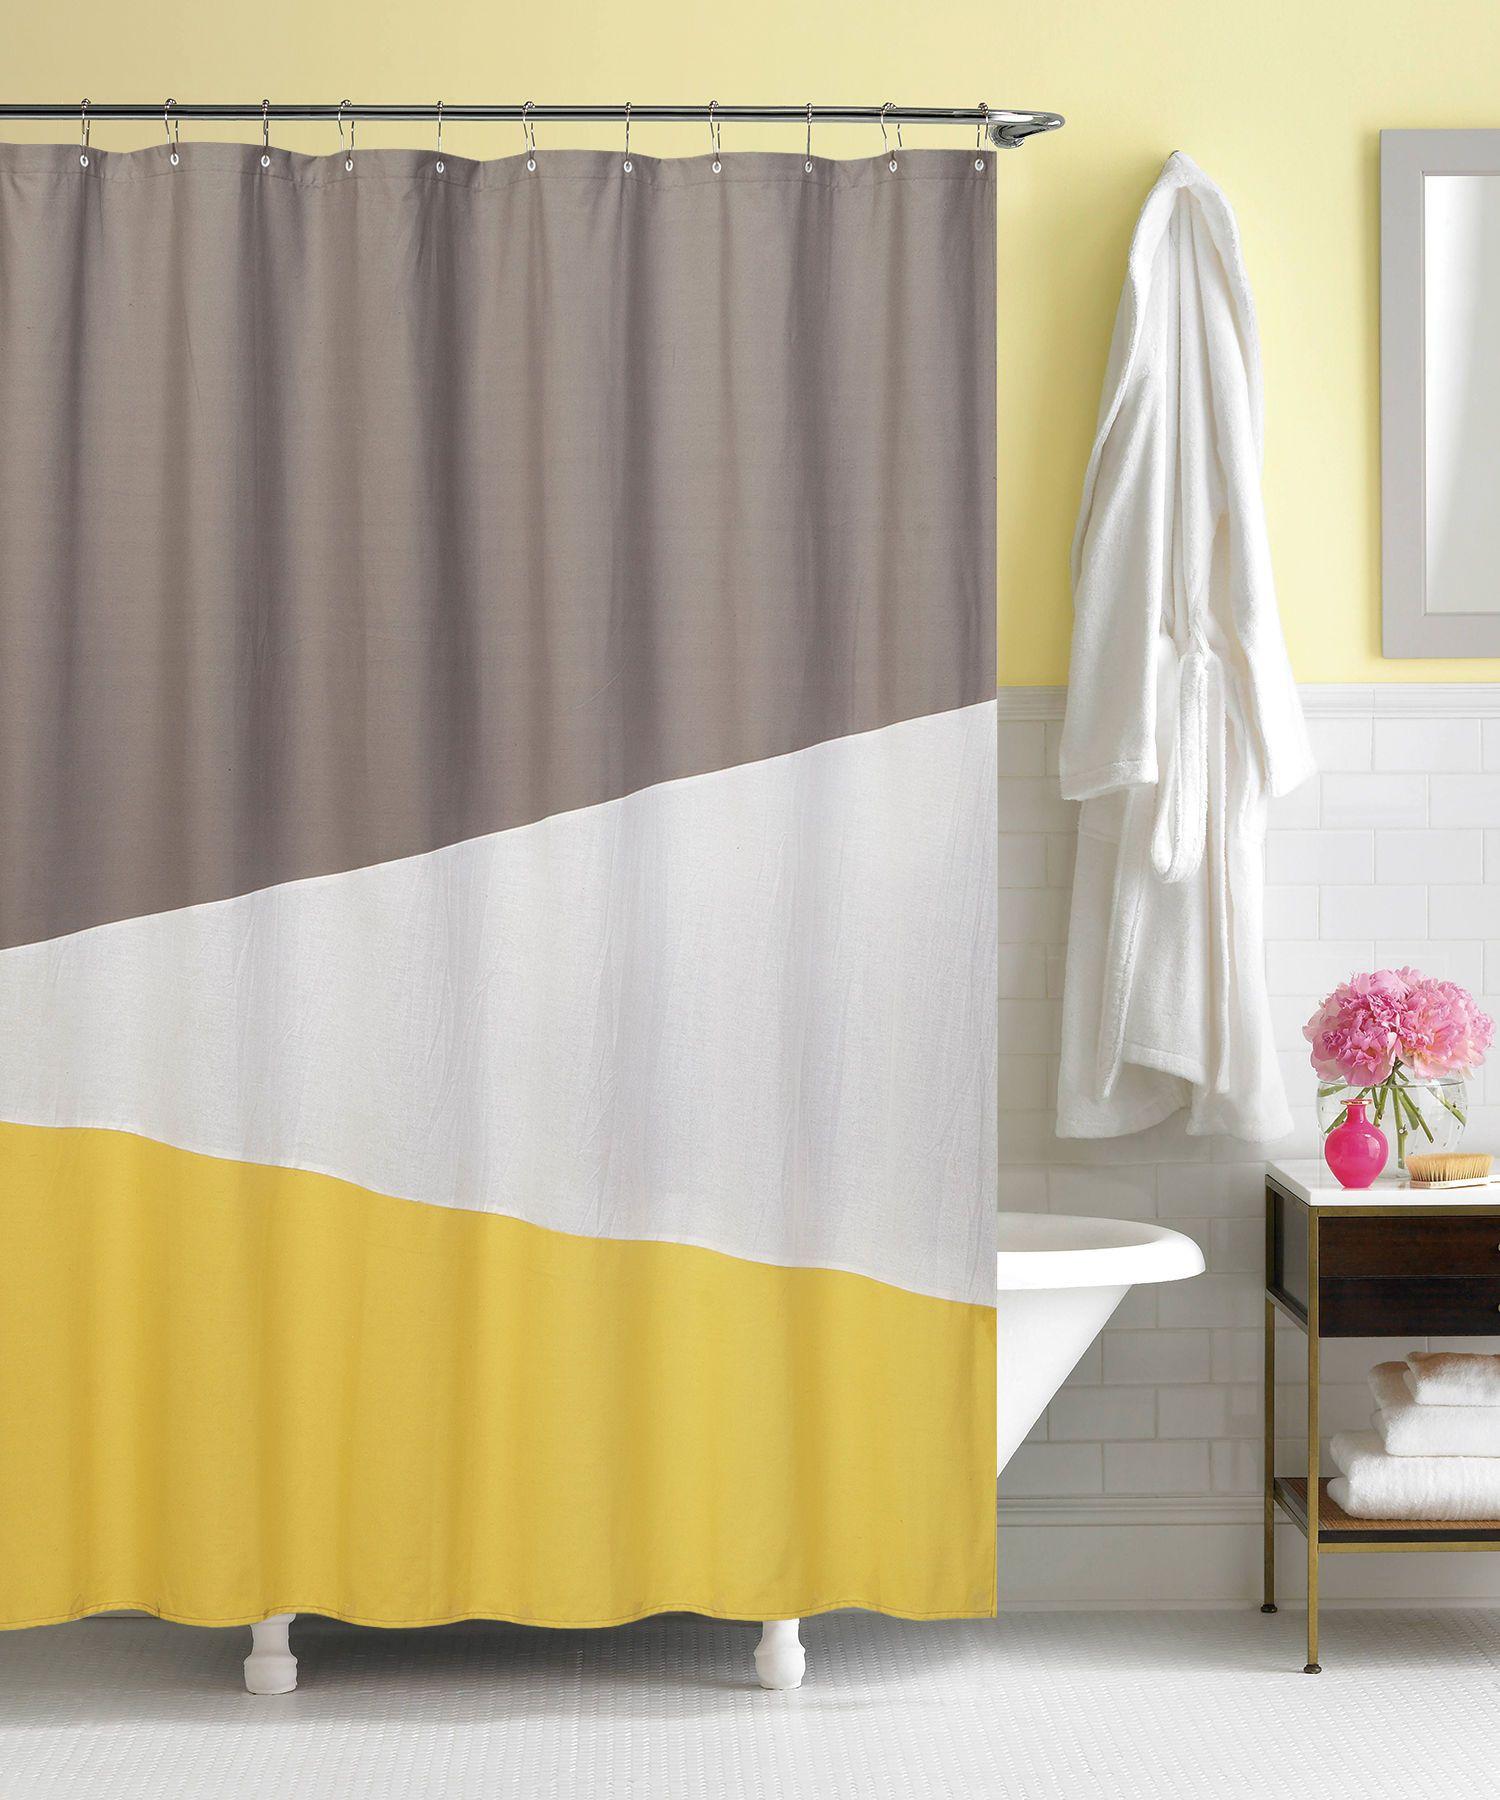 Bathroom Color Block Curtains Curtains Purple Shower Curtain